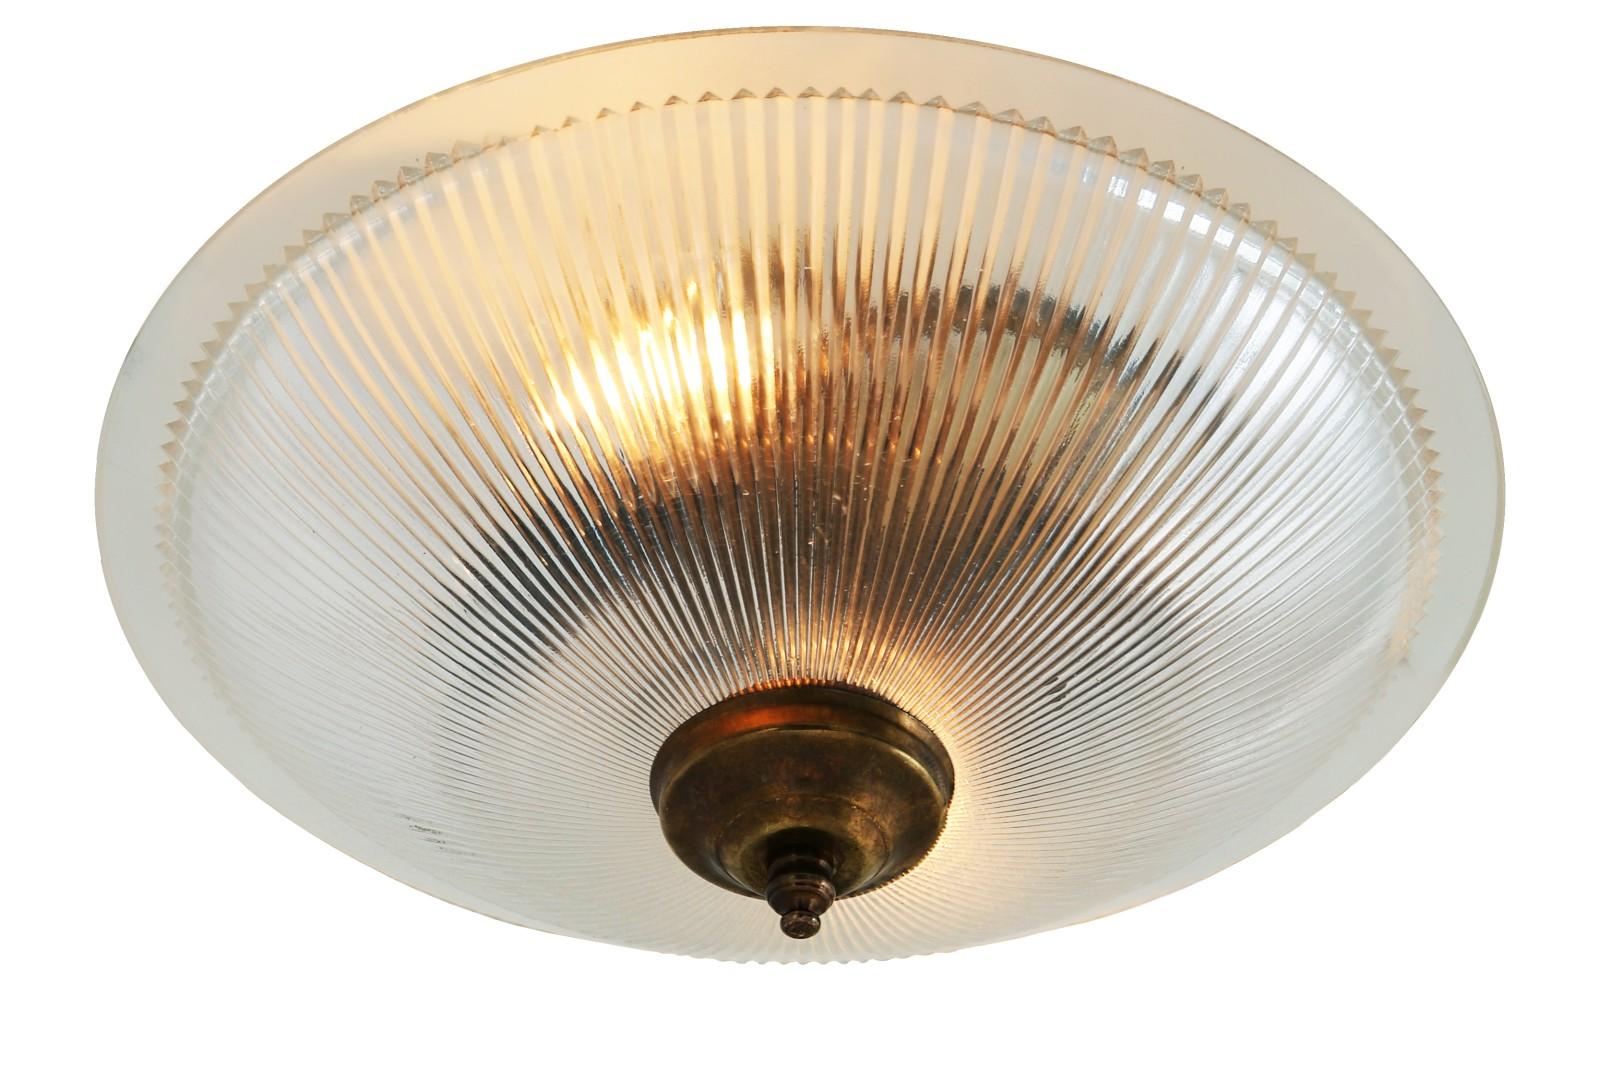 Nicosa Ceiling Light Antique Brass